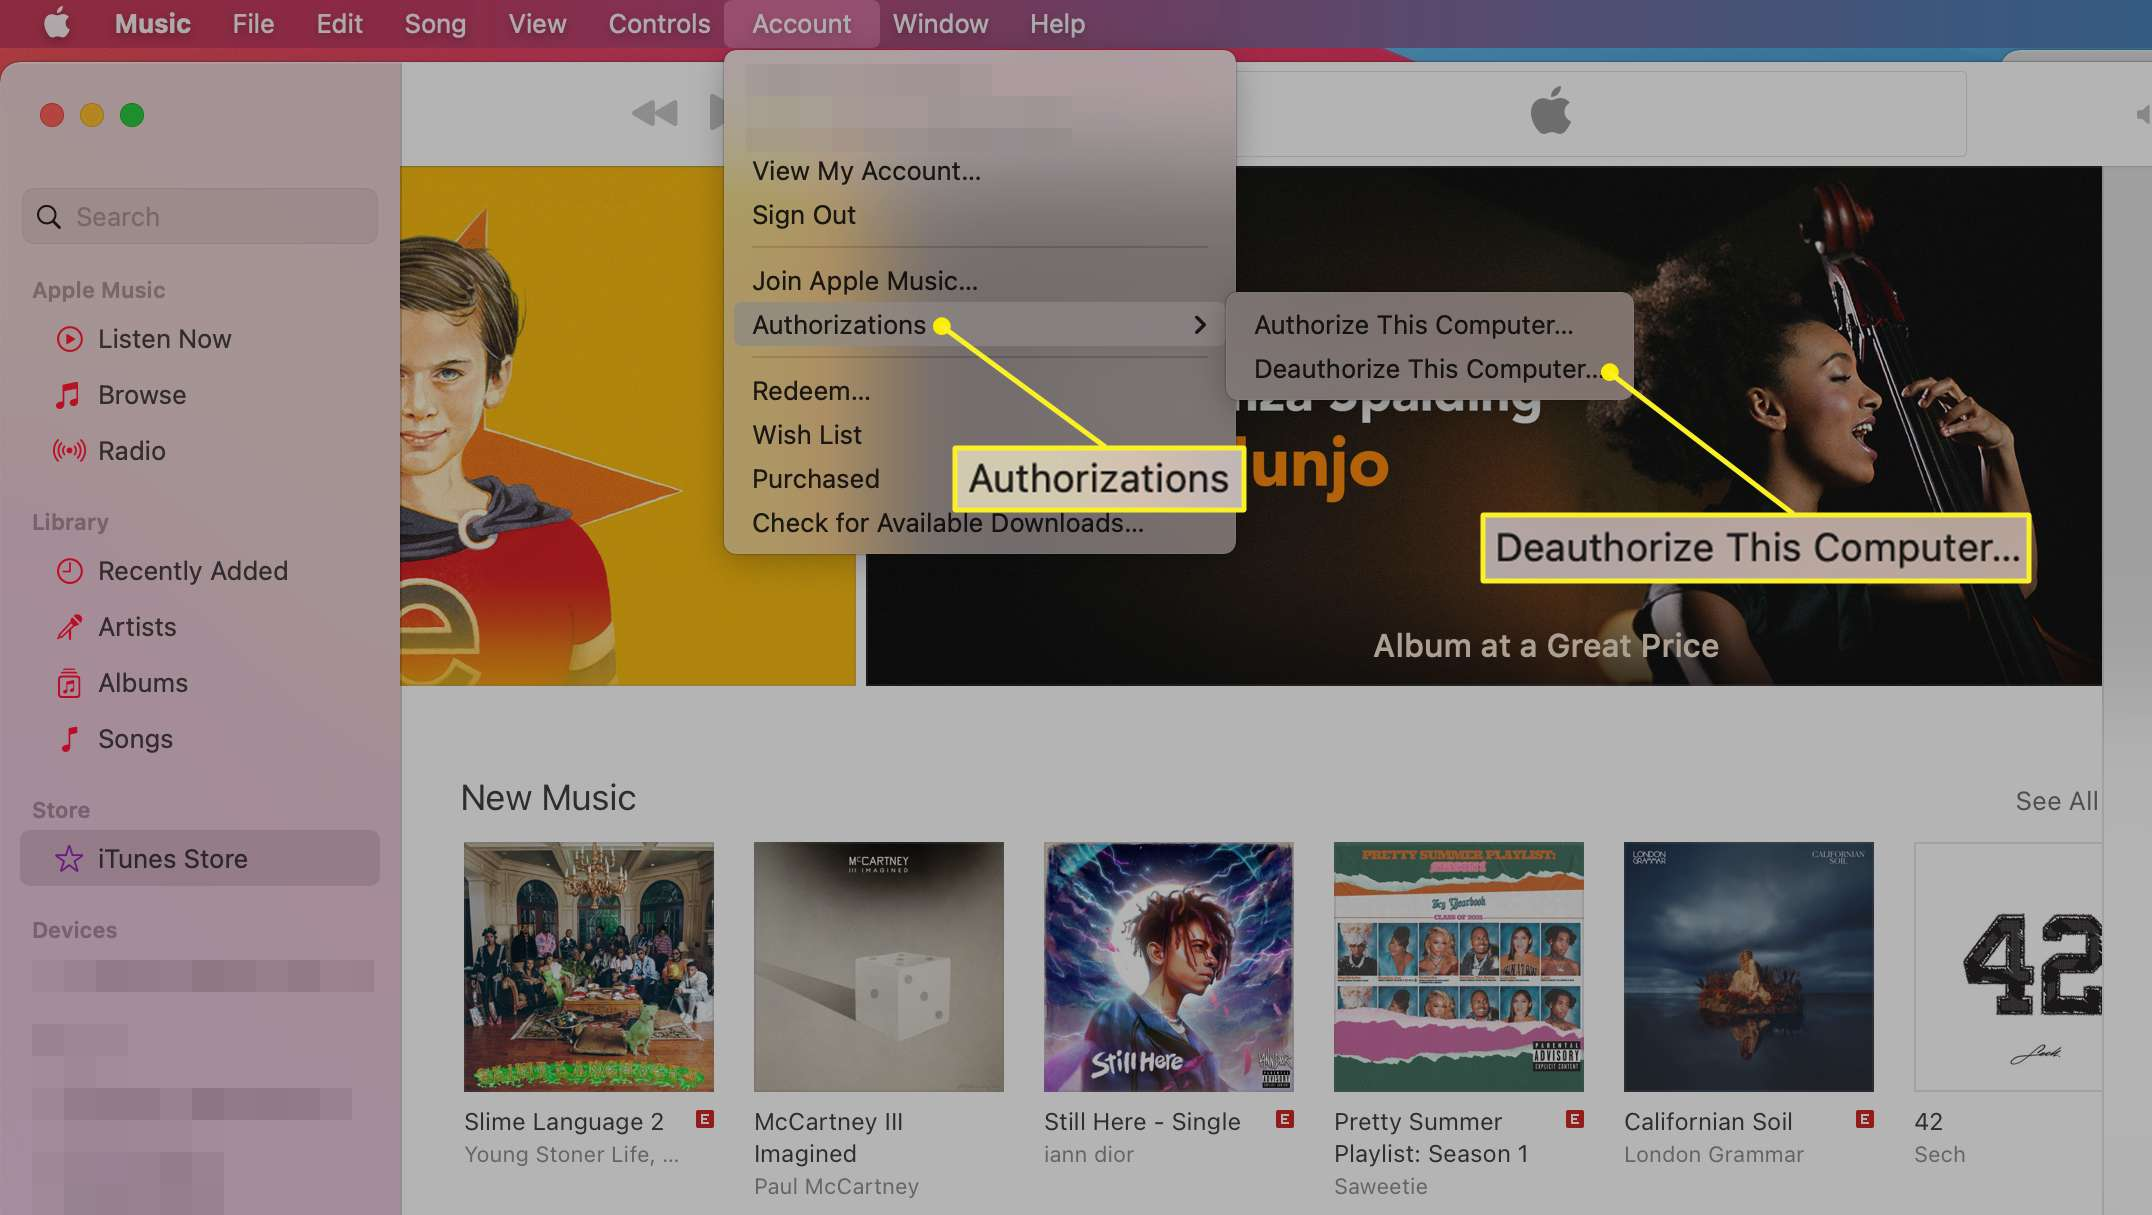 Music app Account menu showing Authorizations